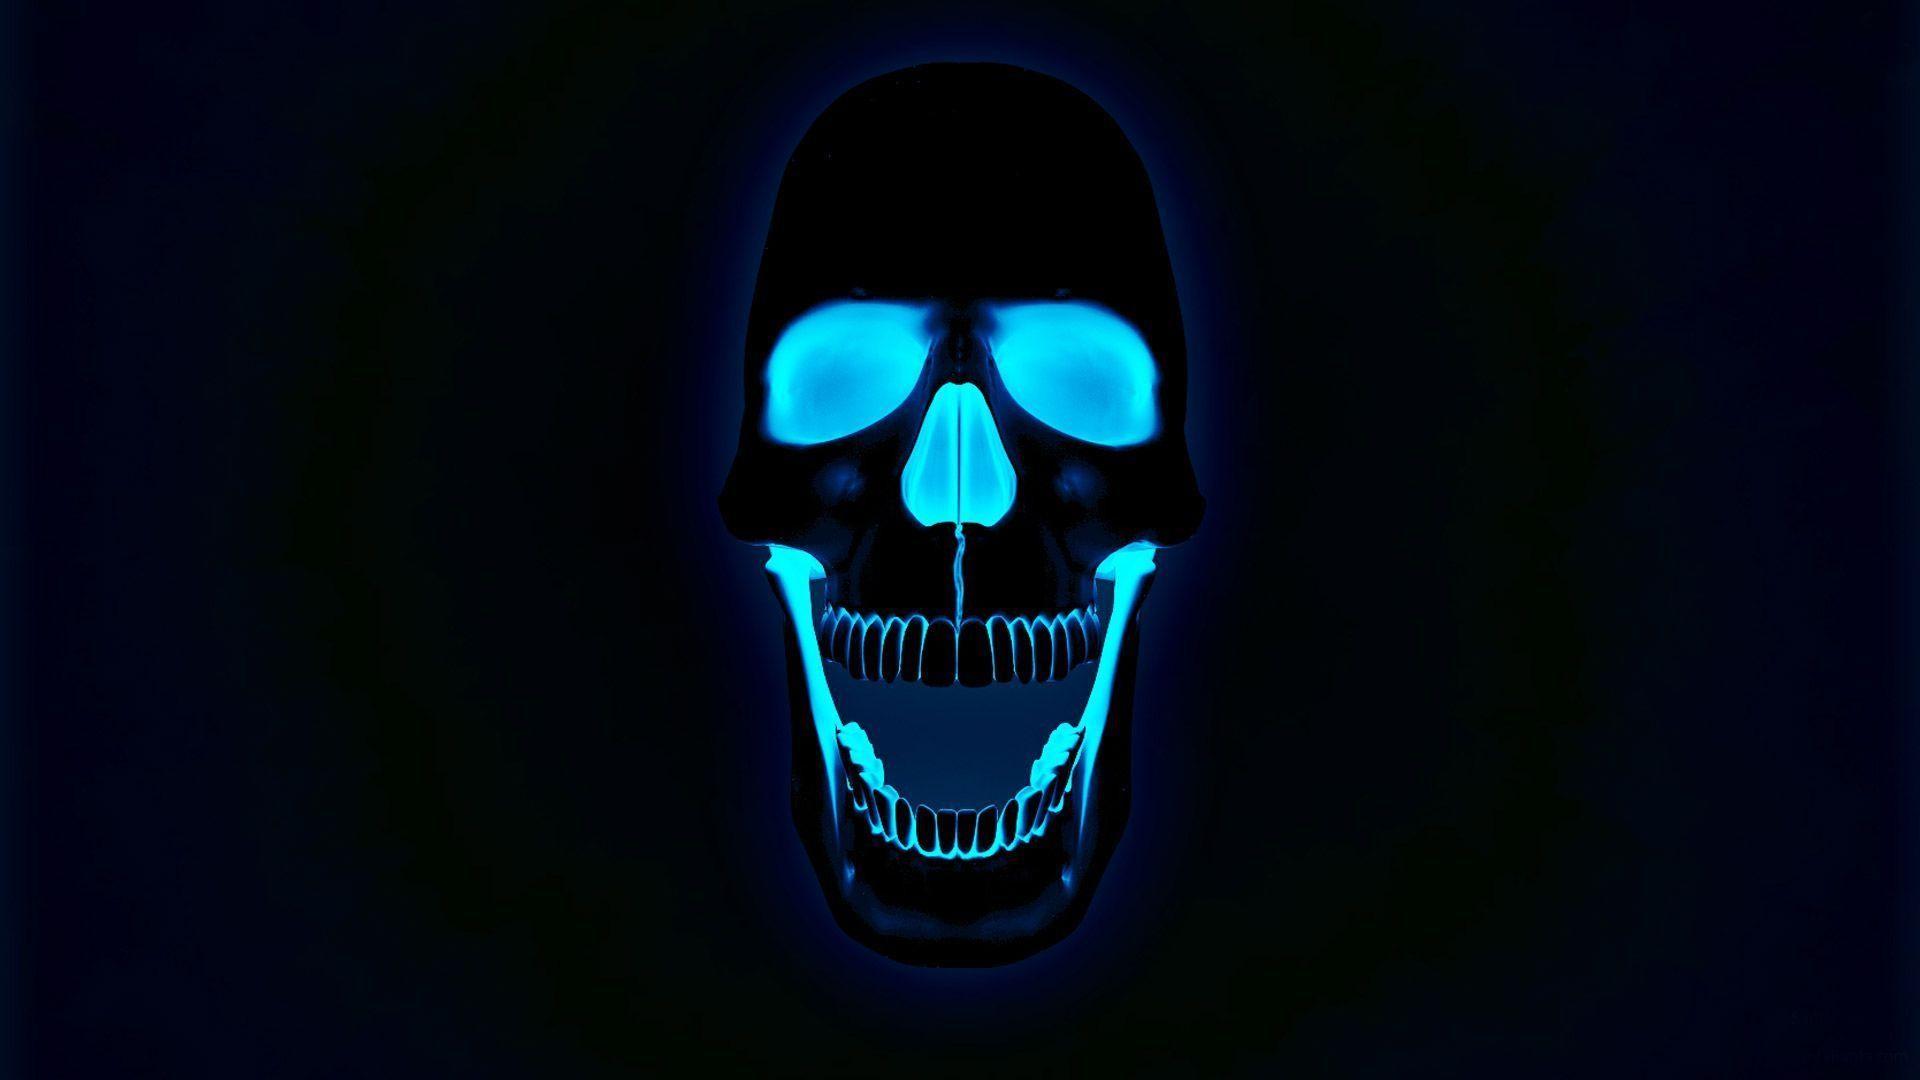 Blue Fire Skull Photo Wallpaper HD – dlwallhd.